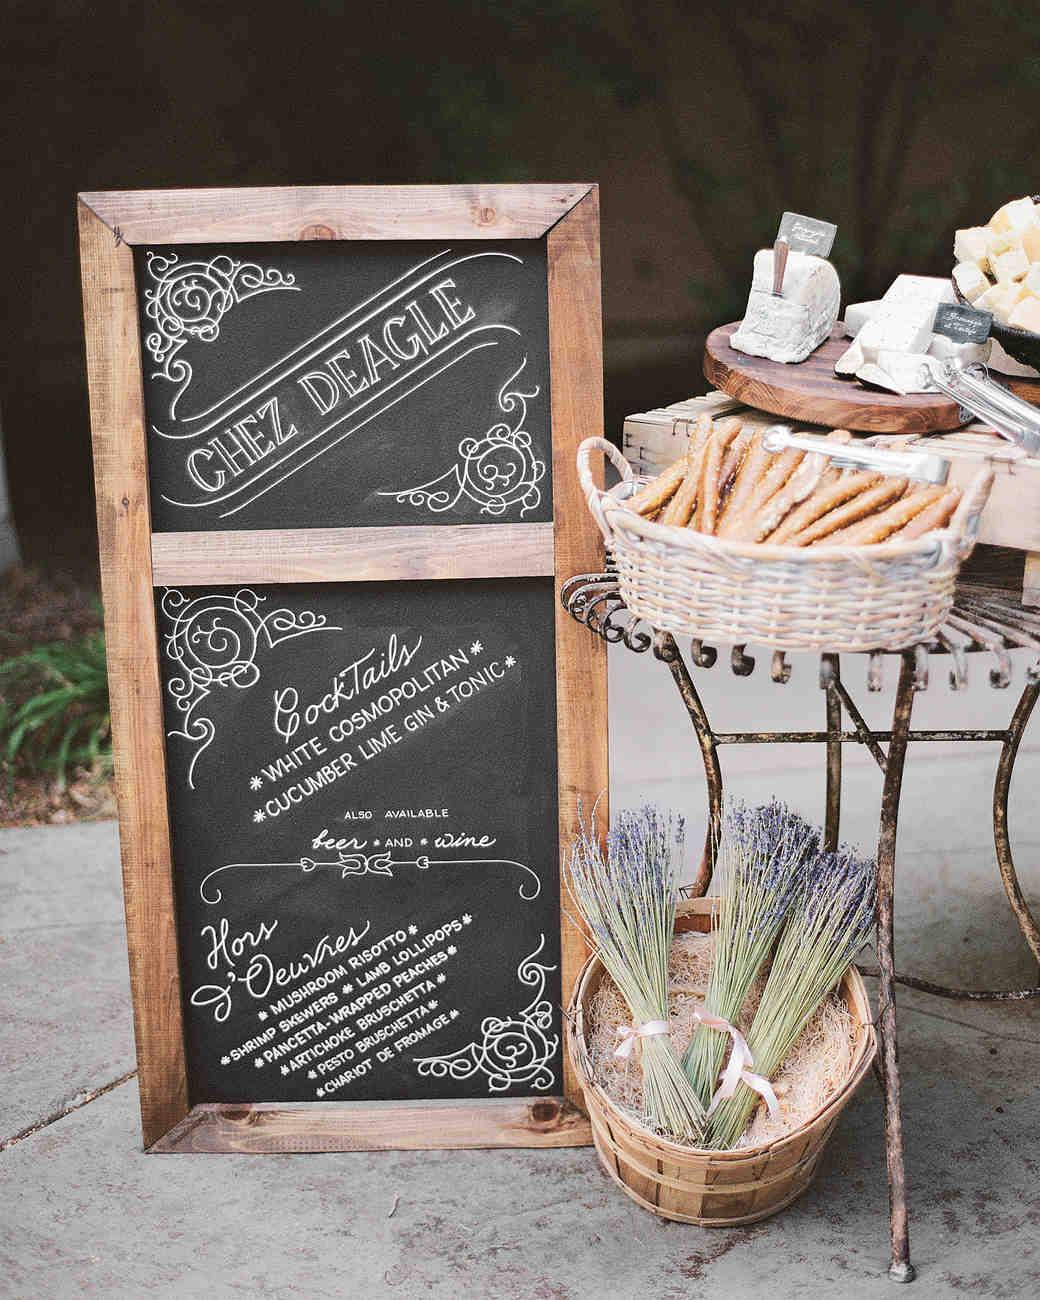 chalkboard-sign-reception-cocktails-000032480004-mwds110864.jpg